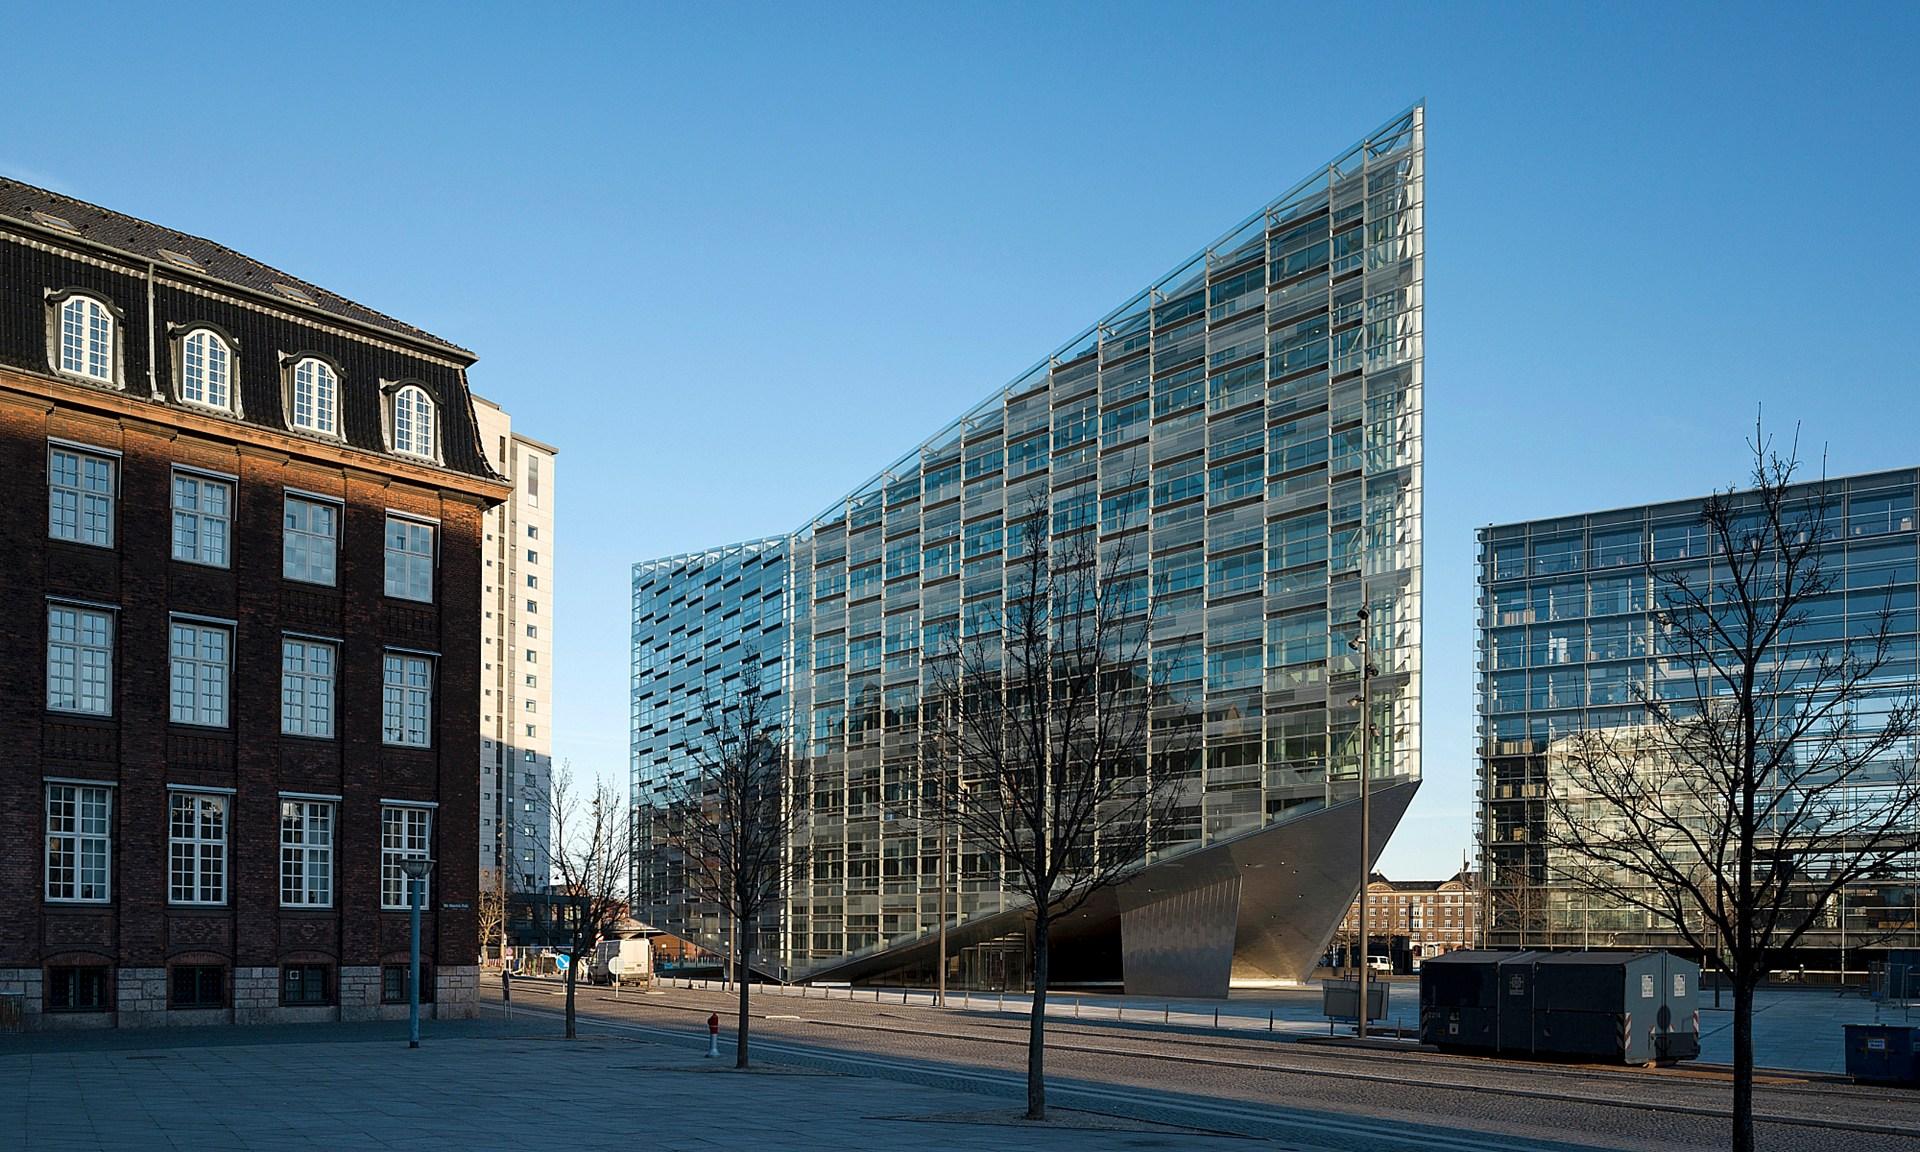 Krystallen   Nykredits nye bygning   6.850 m2   2008-2011     Arkitekt: Schmidt, Hammer & Lassen A/S